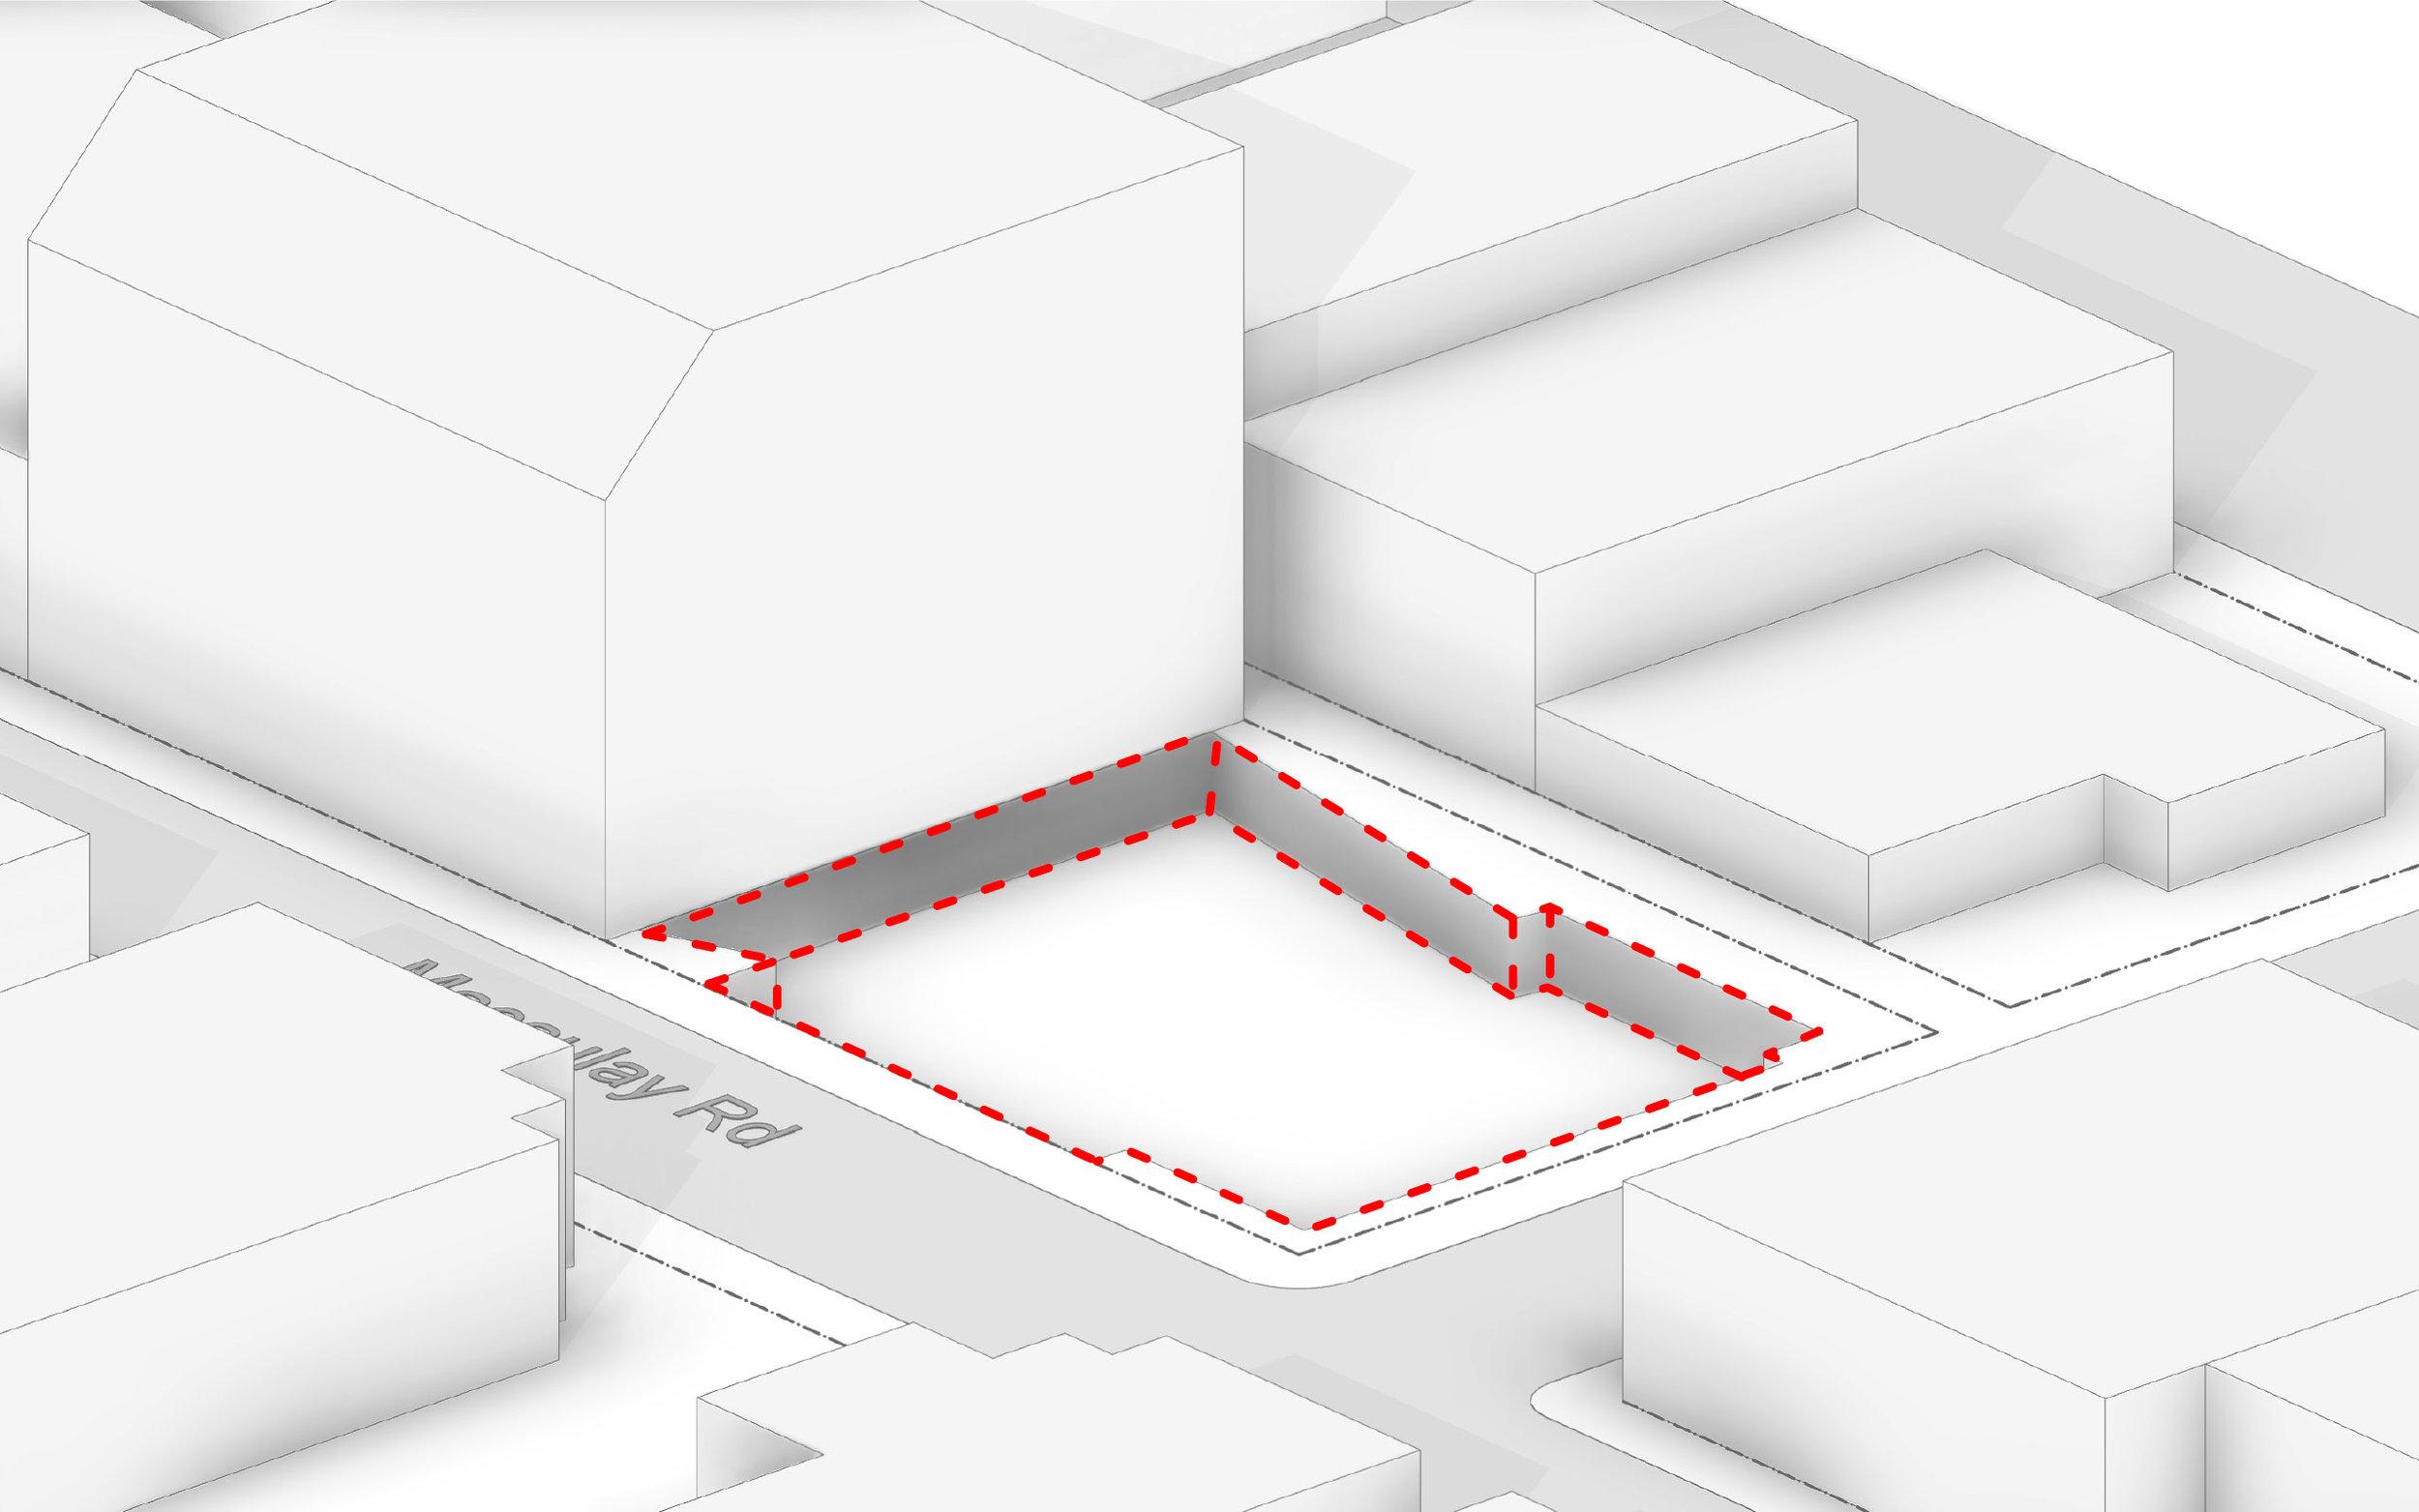 Extend form into basement